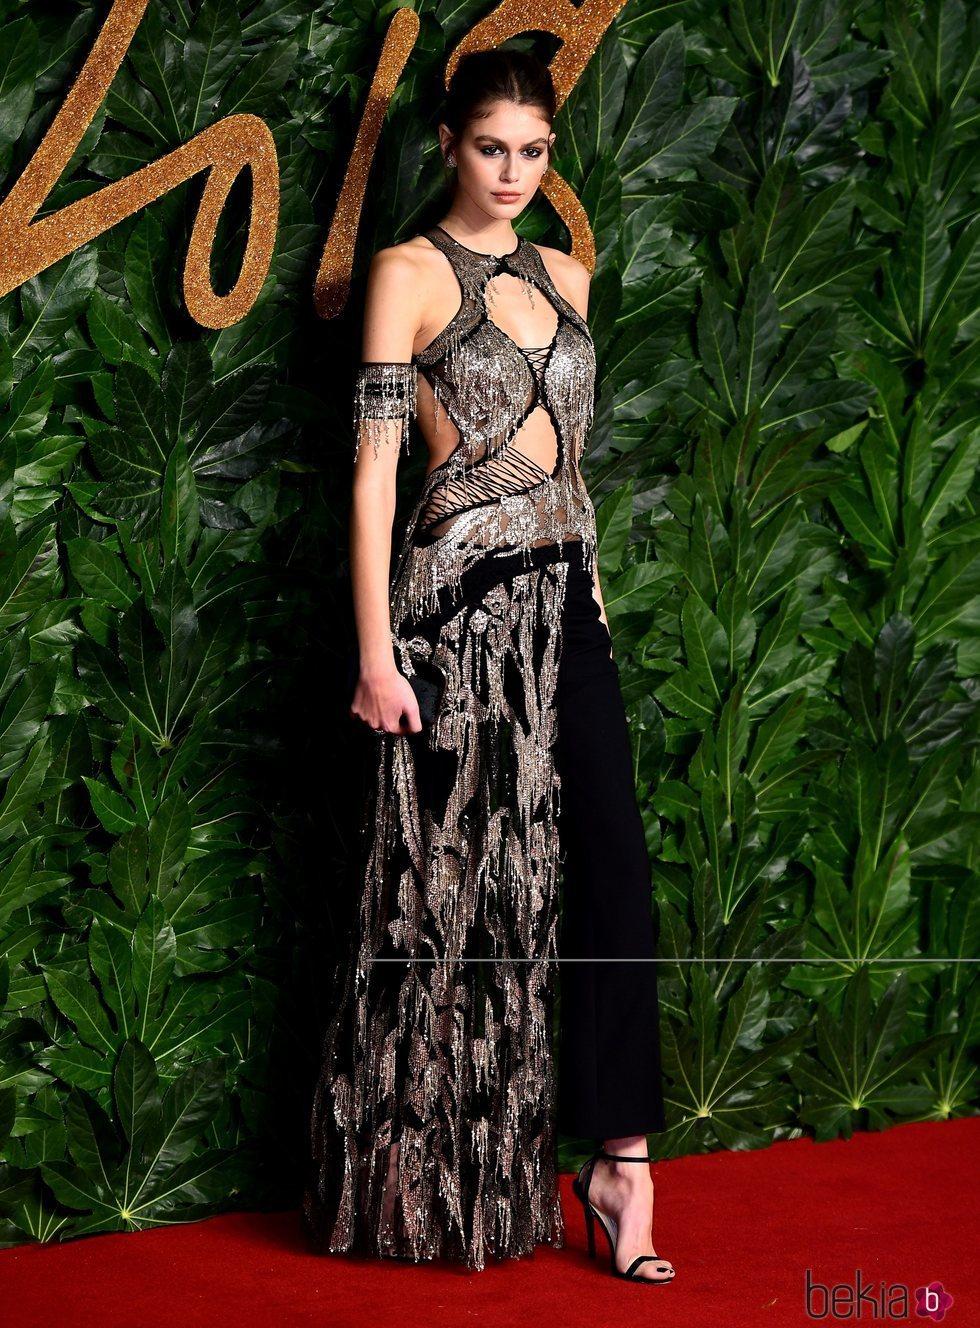 Kaia Gerber en los British Fashion Awards 2018